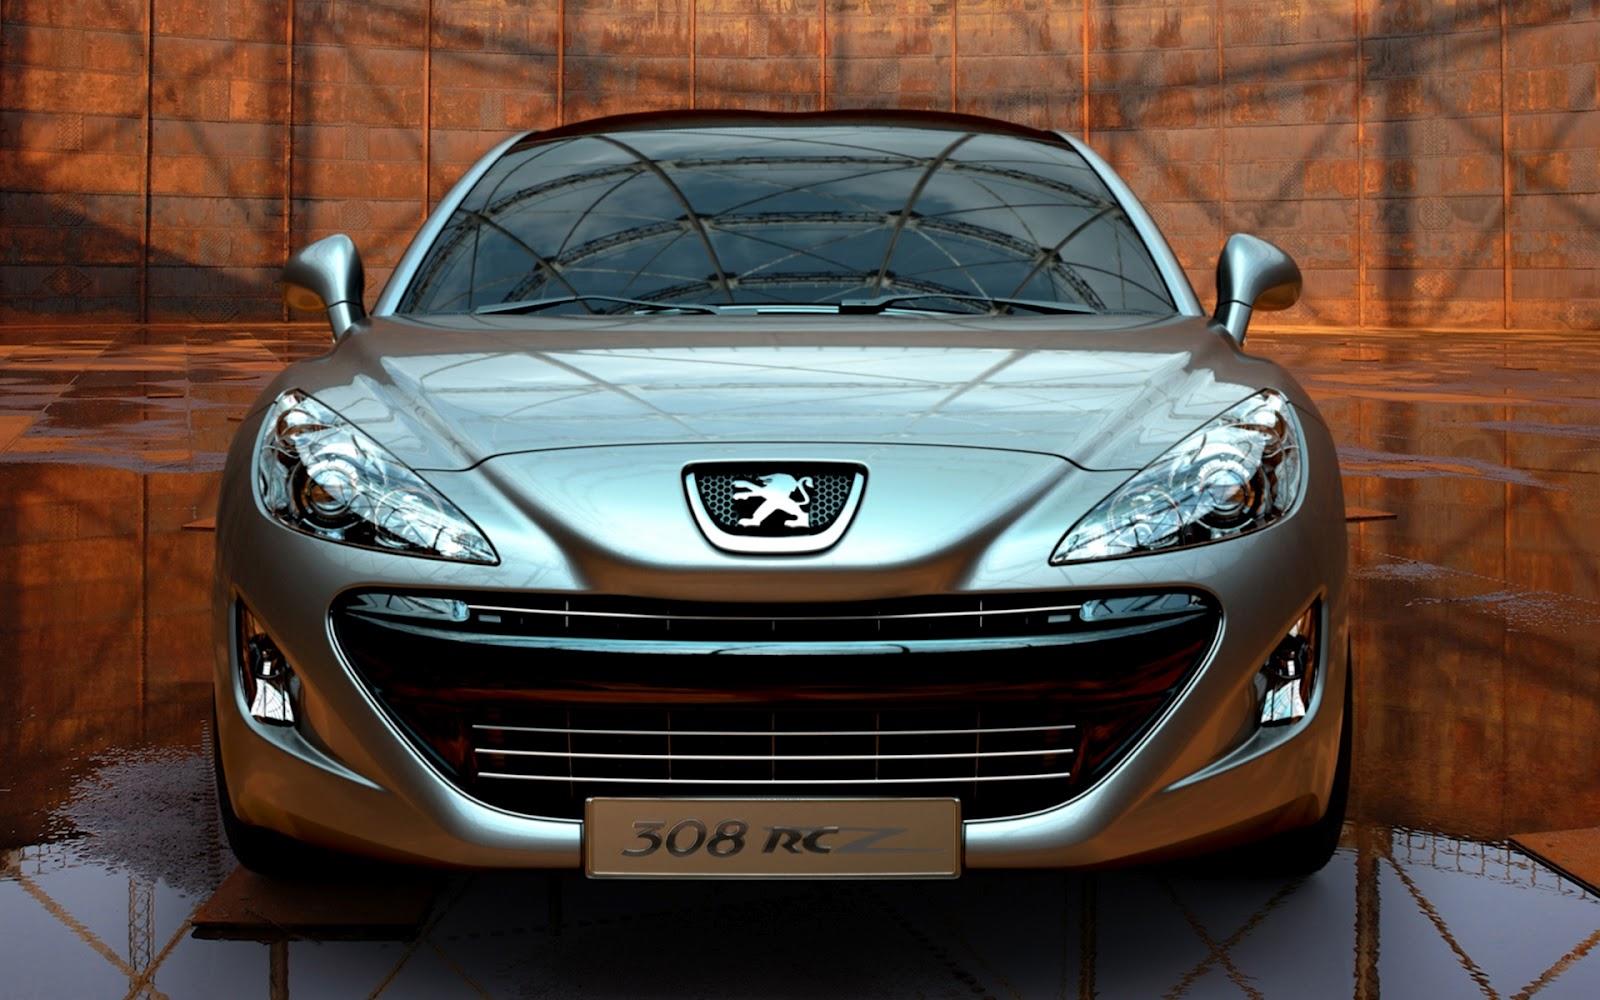 http://3.bp.blogspot.com/-44TcLYGJi_k/UDU9Hc3YHkI/AAAAAAAAAPk/_ro3eXjER-M/s1600/2012-08-22-Peugeot-RCZ-12-(carwalls.blogspot.com).jpg